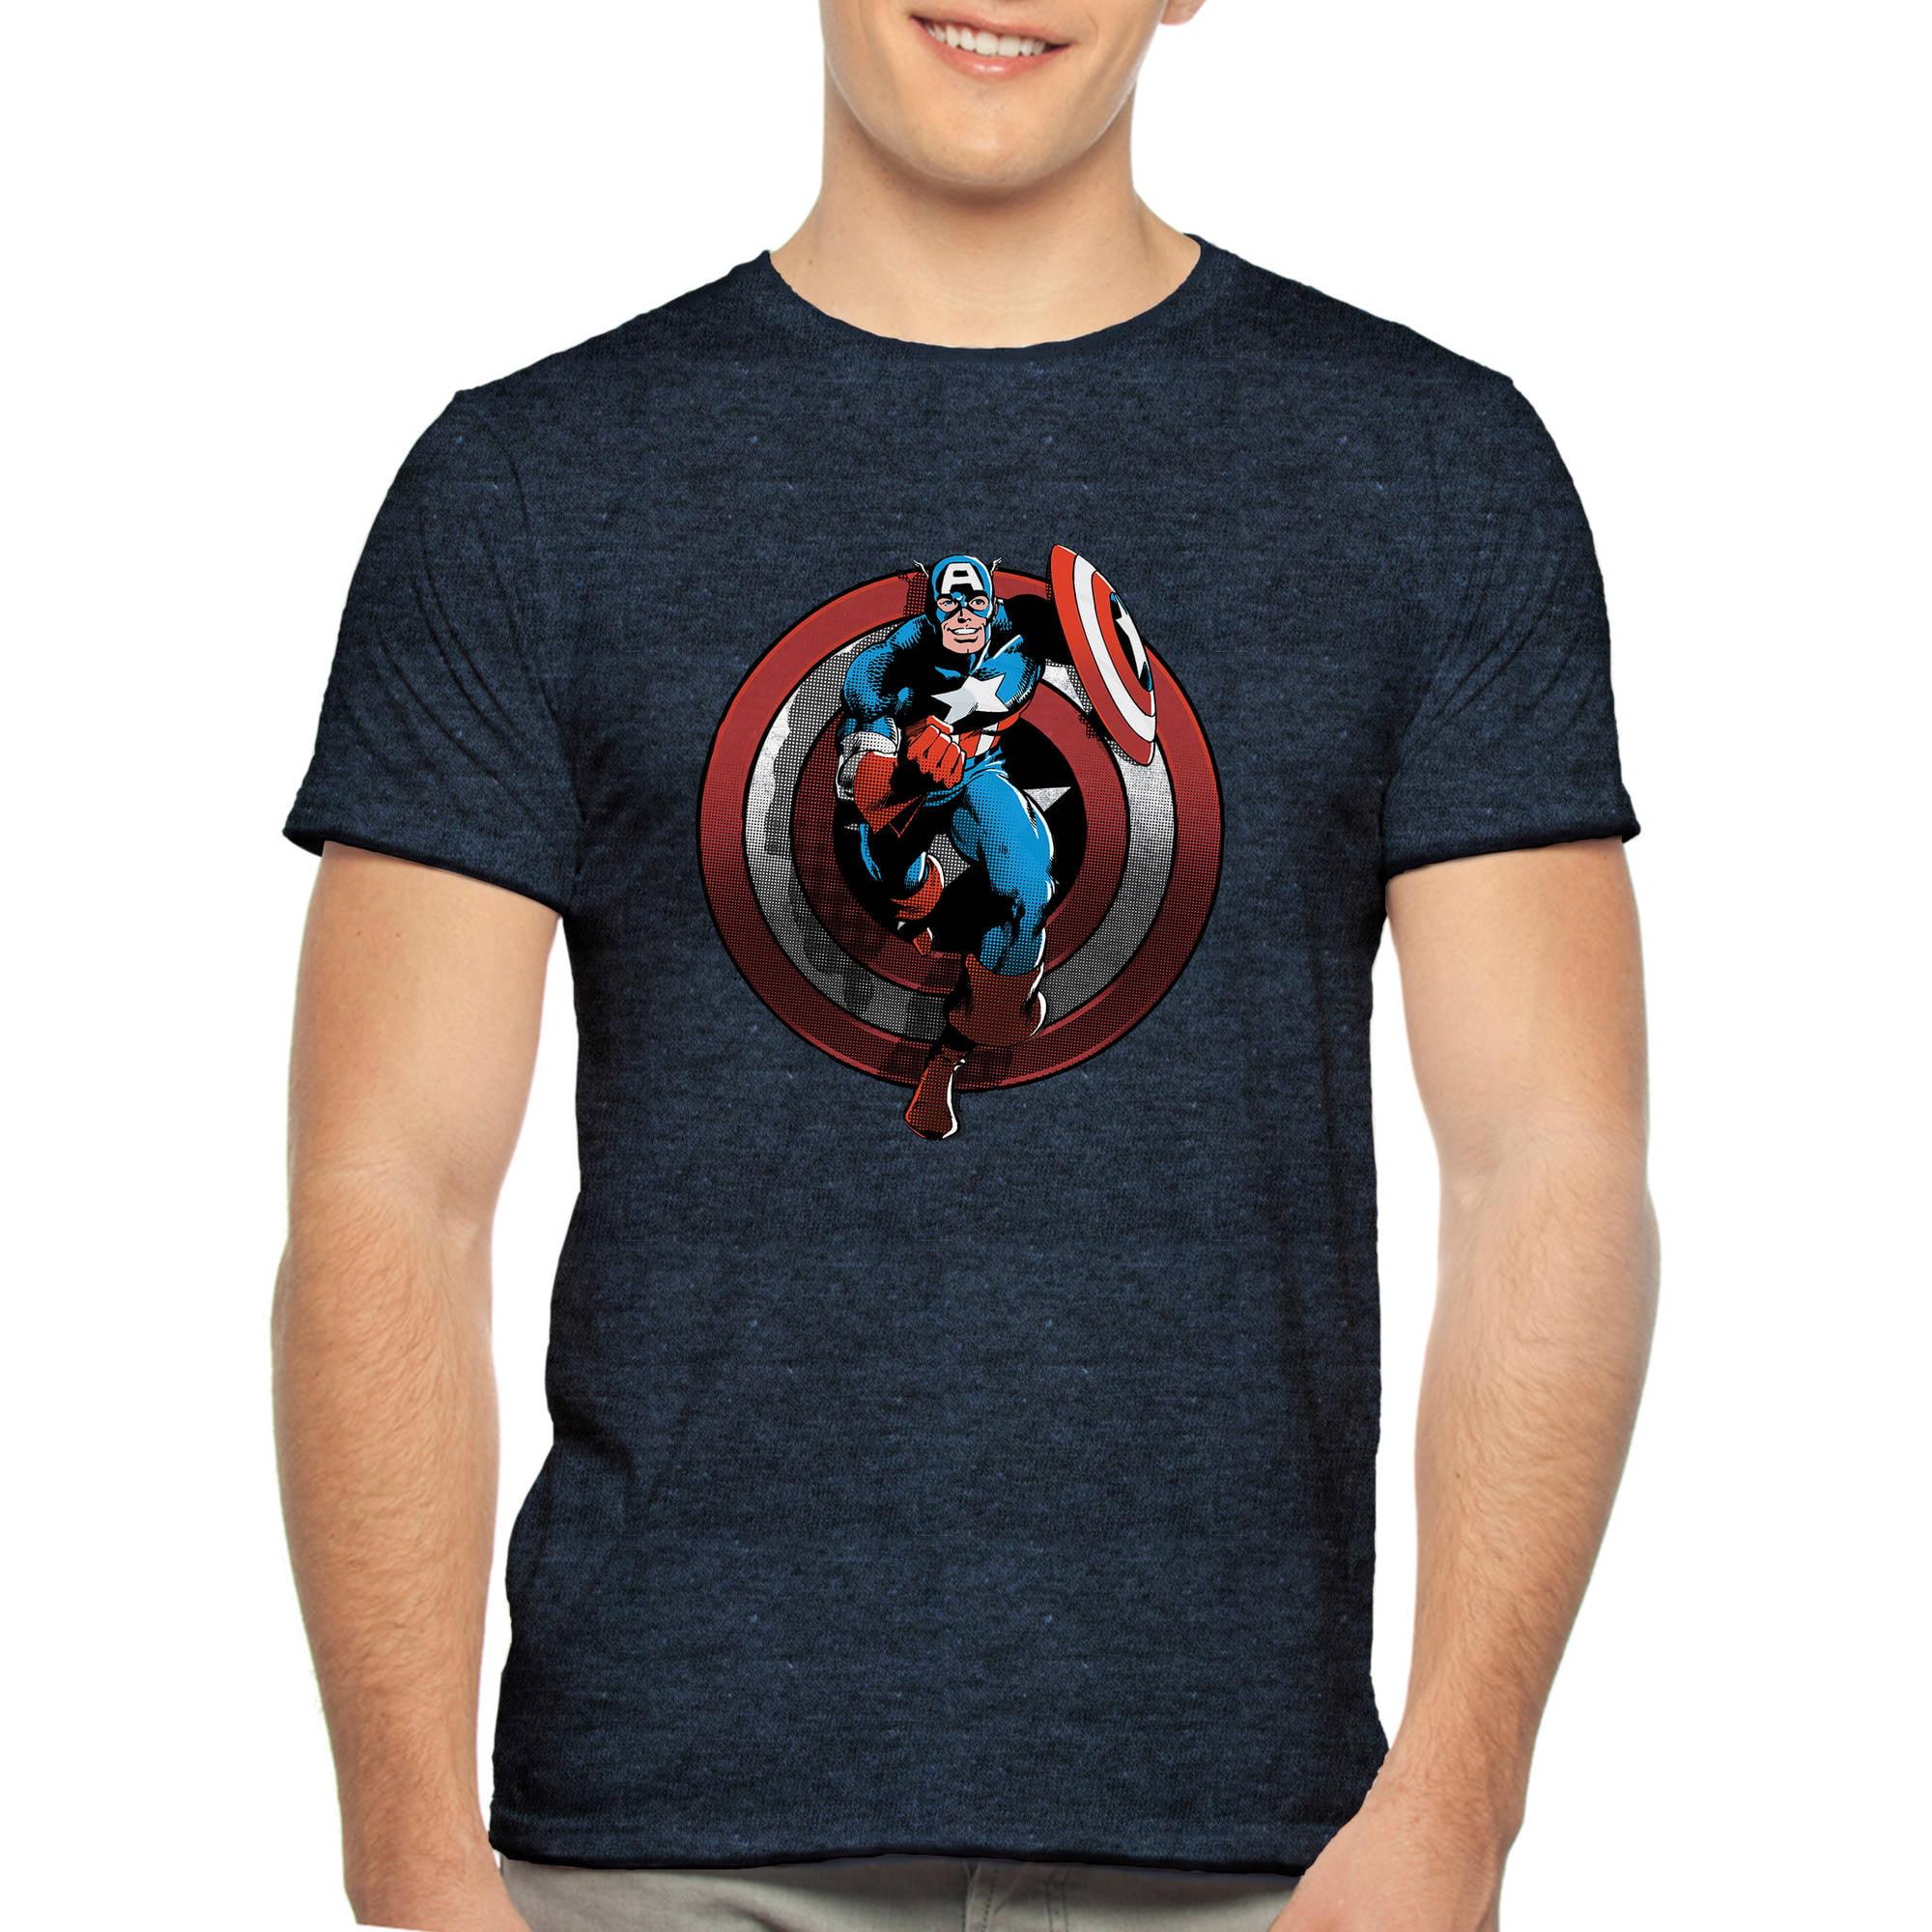 Marvel Captain America on Shield Big Men's Graphic Tee, 2XL